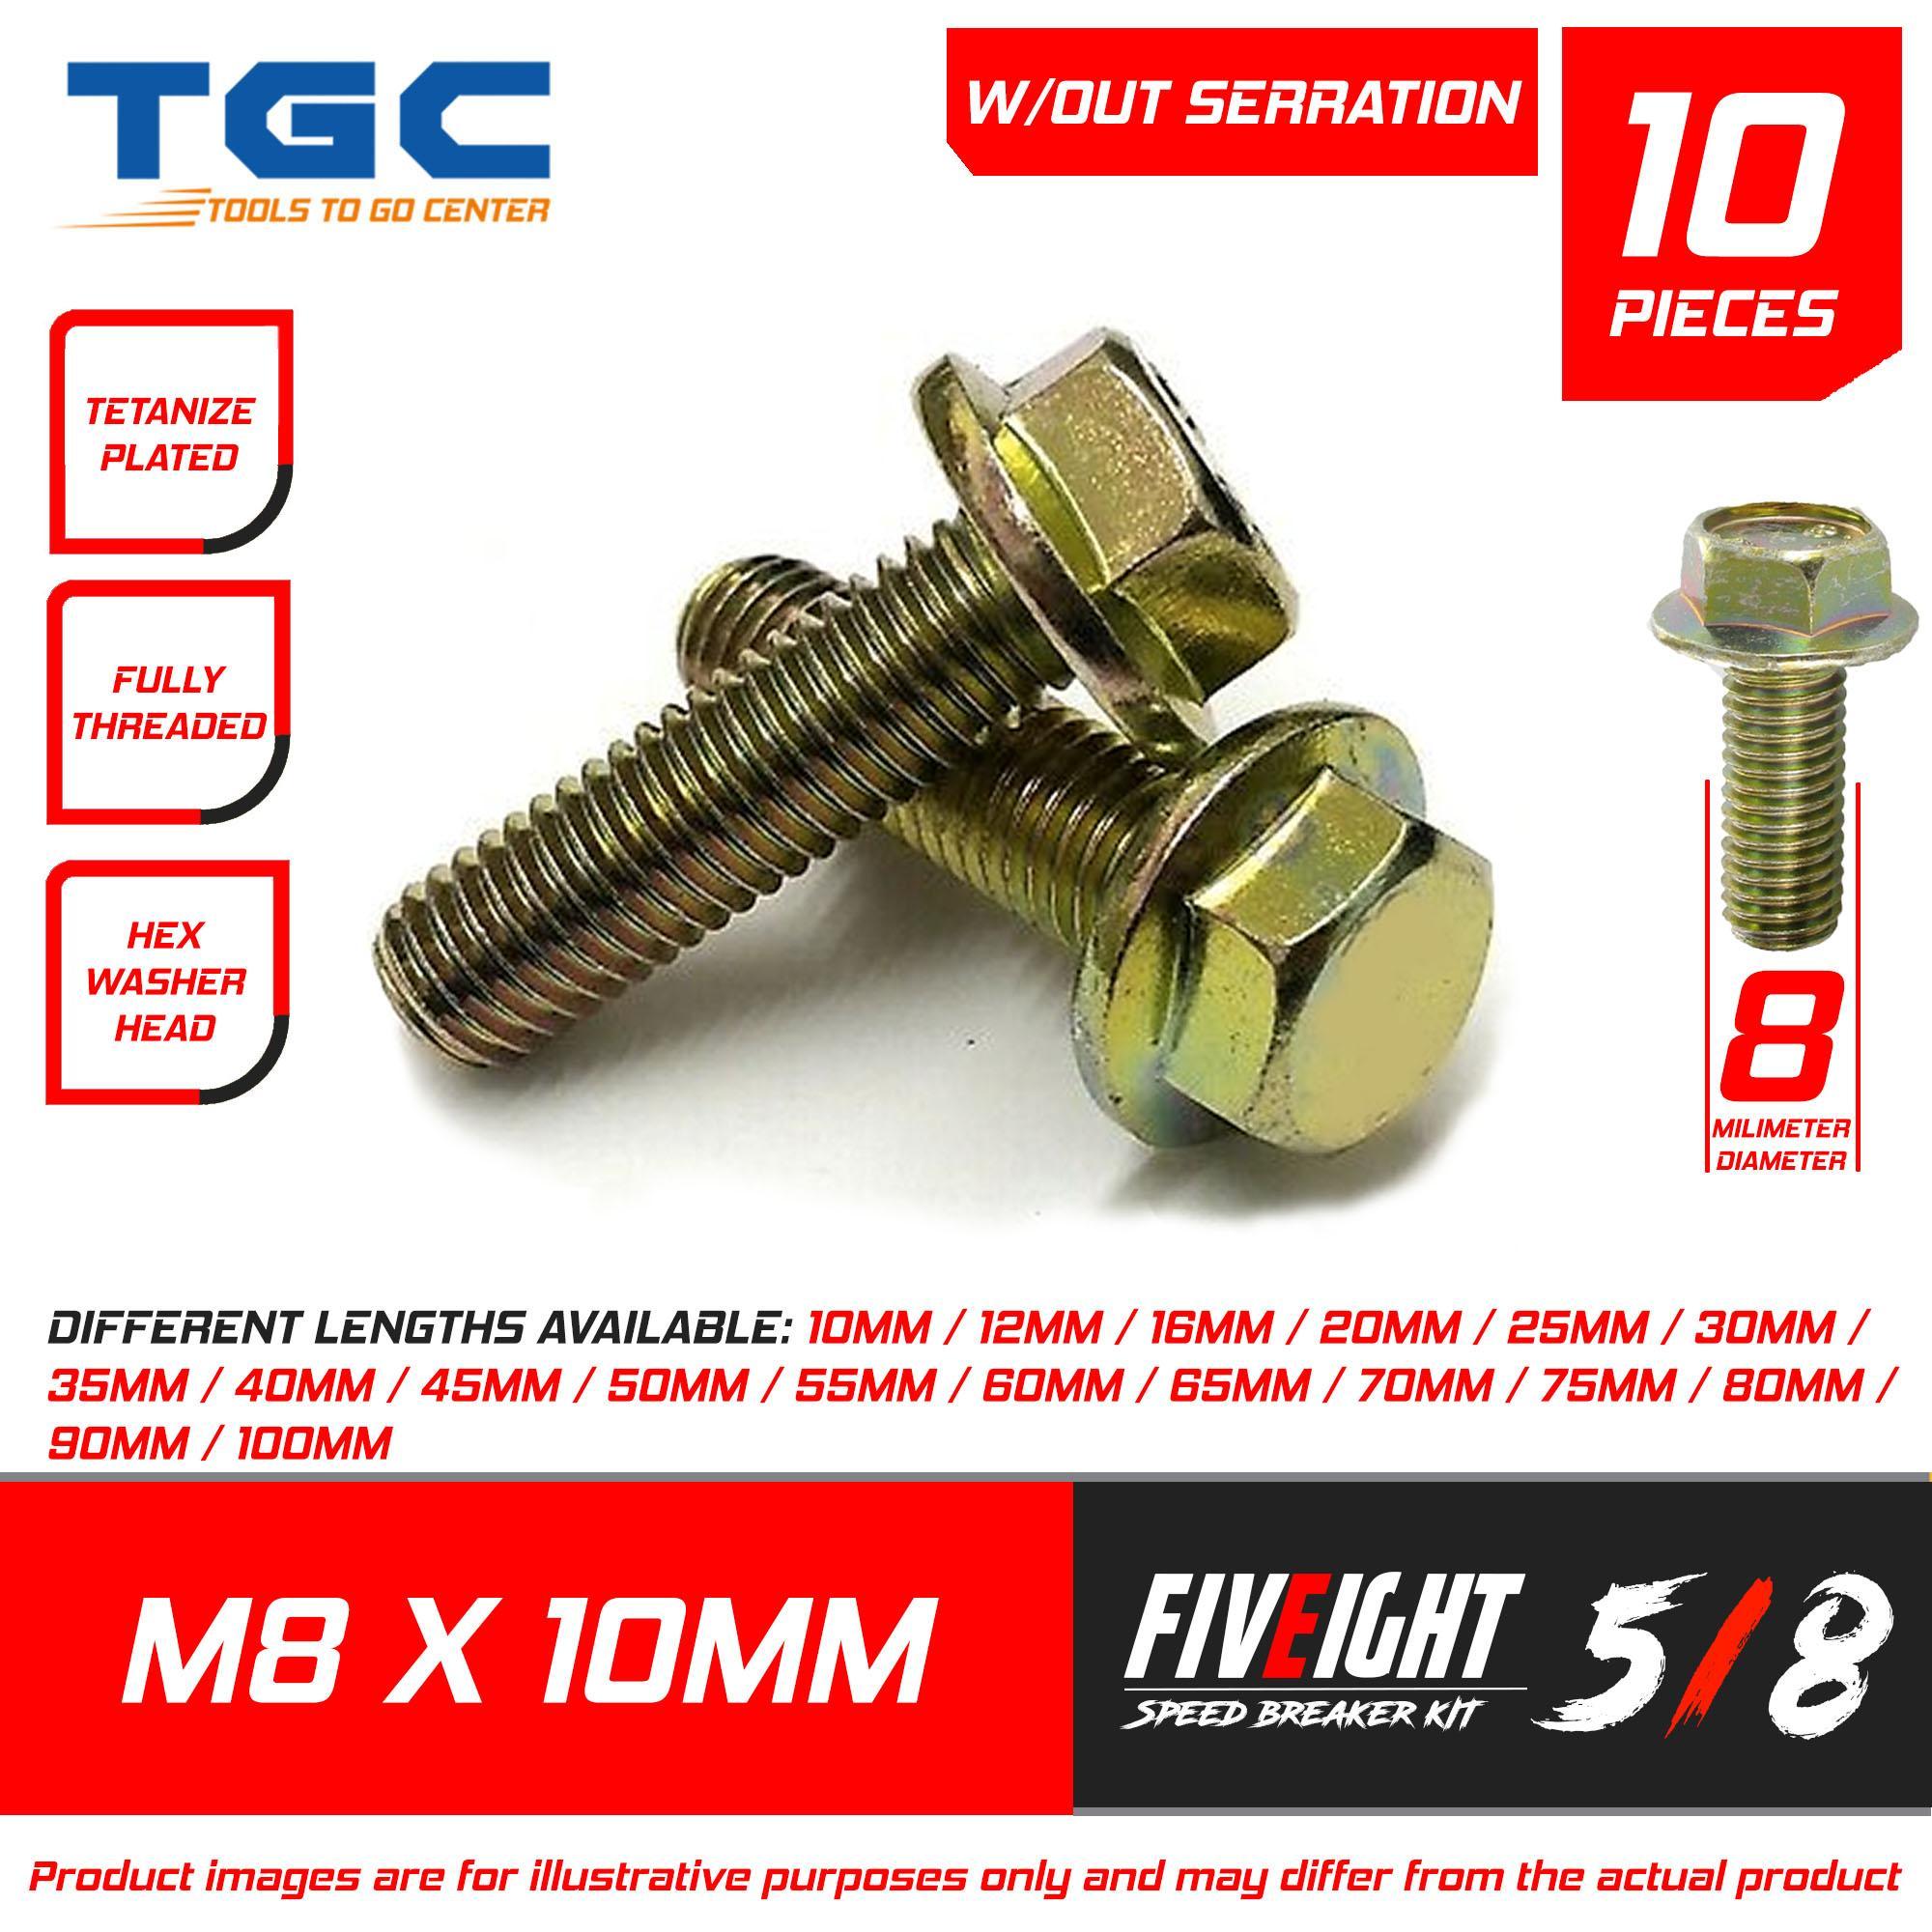 M635 M6 Hex Flange Screws 10Pcs Stainless Steel SS304 Screws Cap Washer Head Bolts Fastener